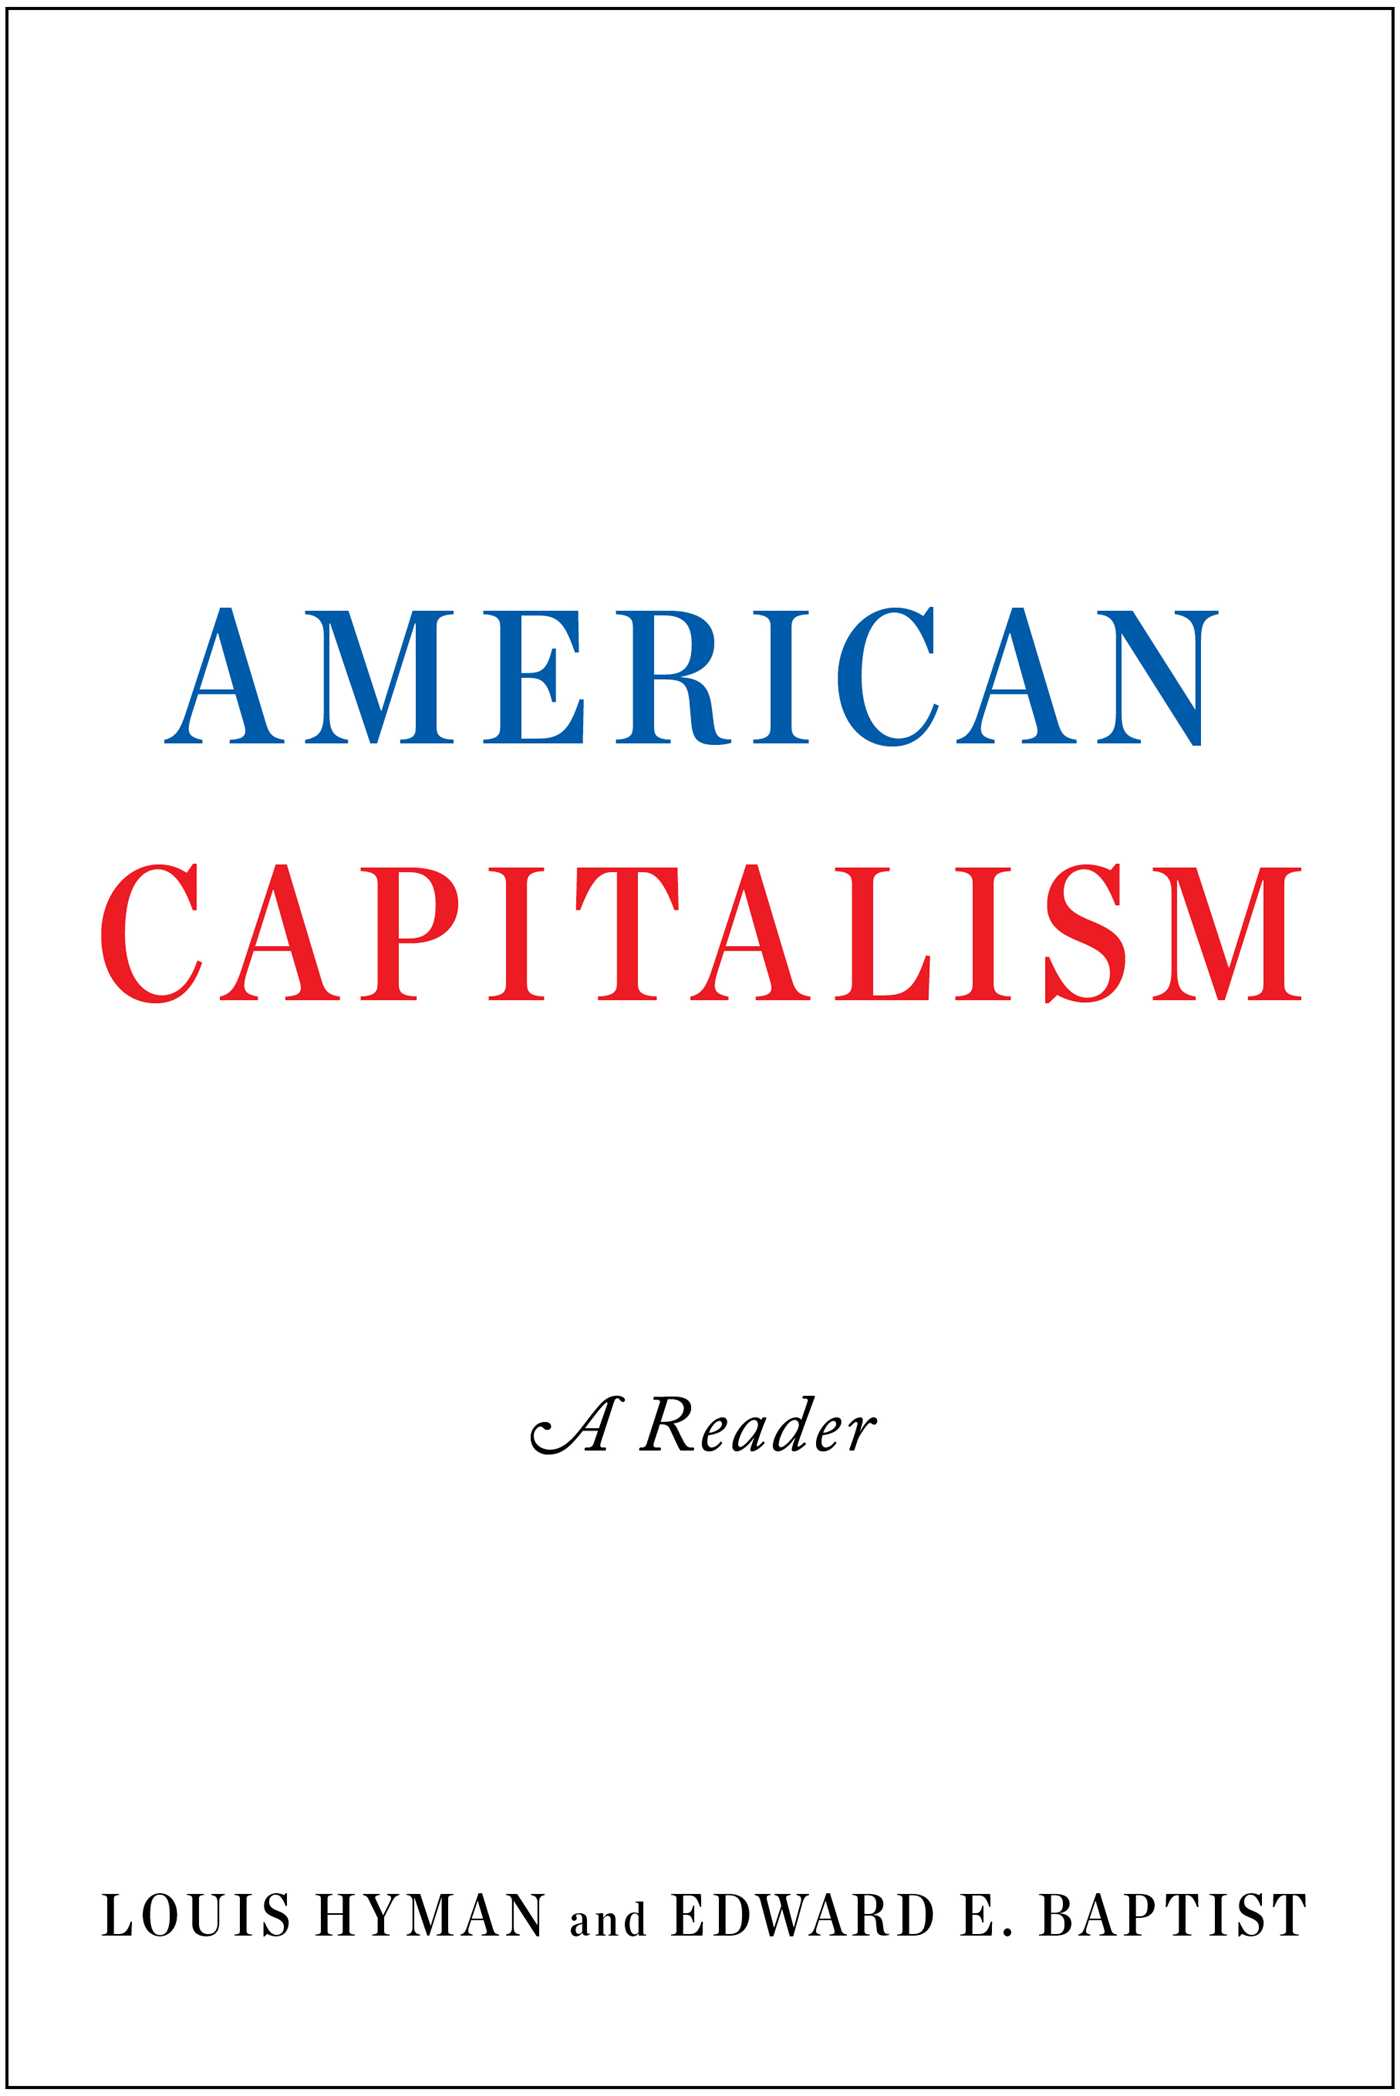 American capitalism 9781476784311 hr